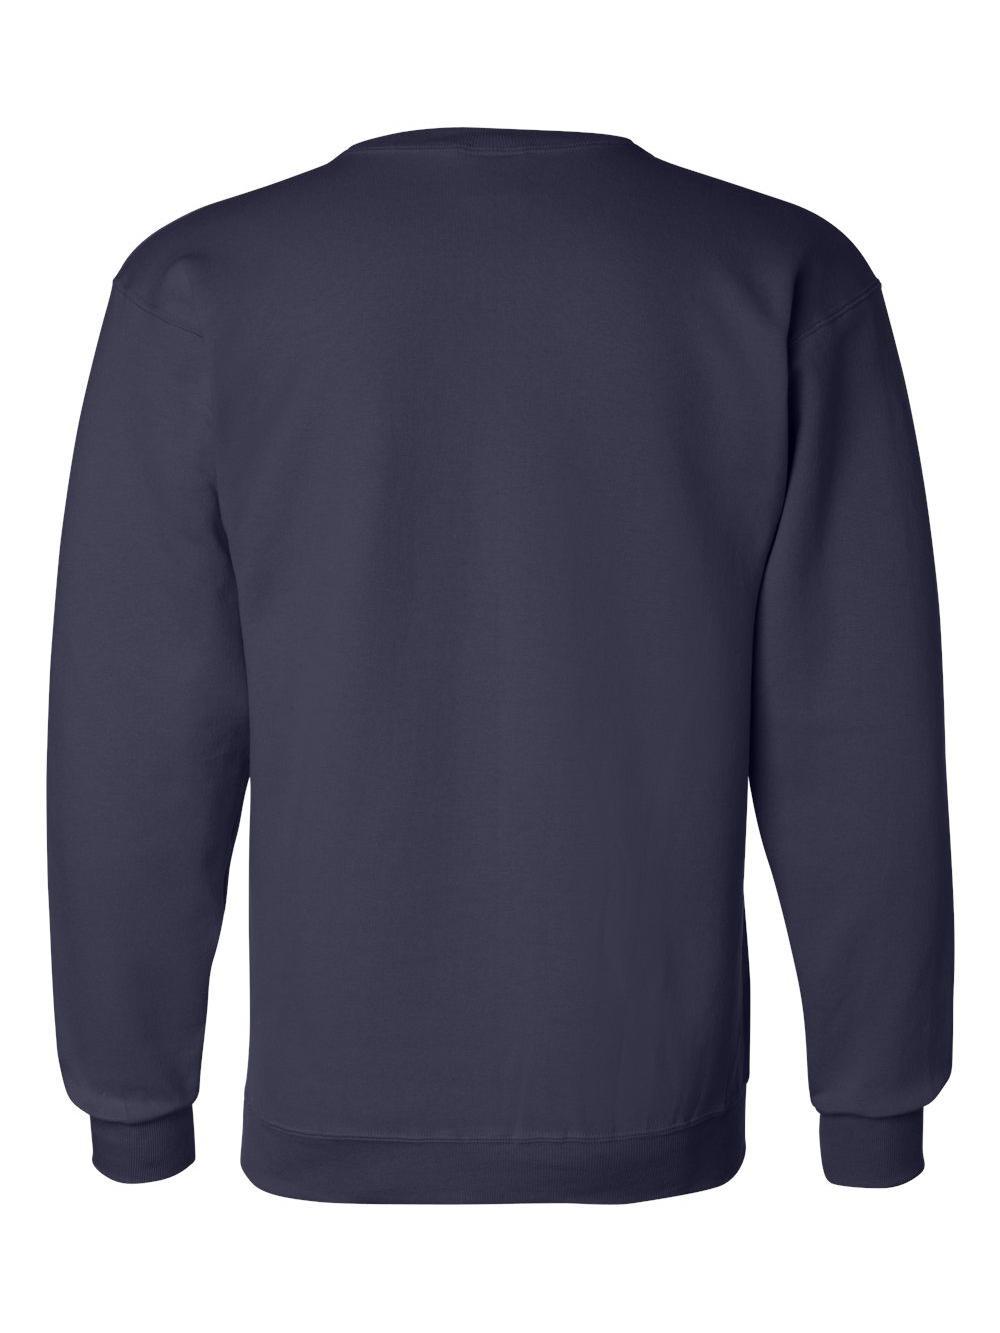 Champion-Double-Dry-Eco-Crewneck-Sweatshirt-S600 thumbnail 19